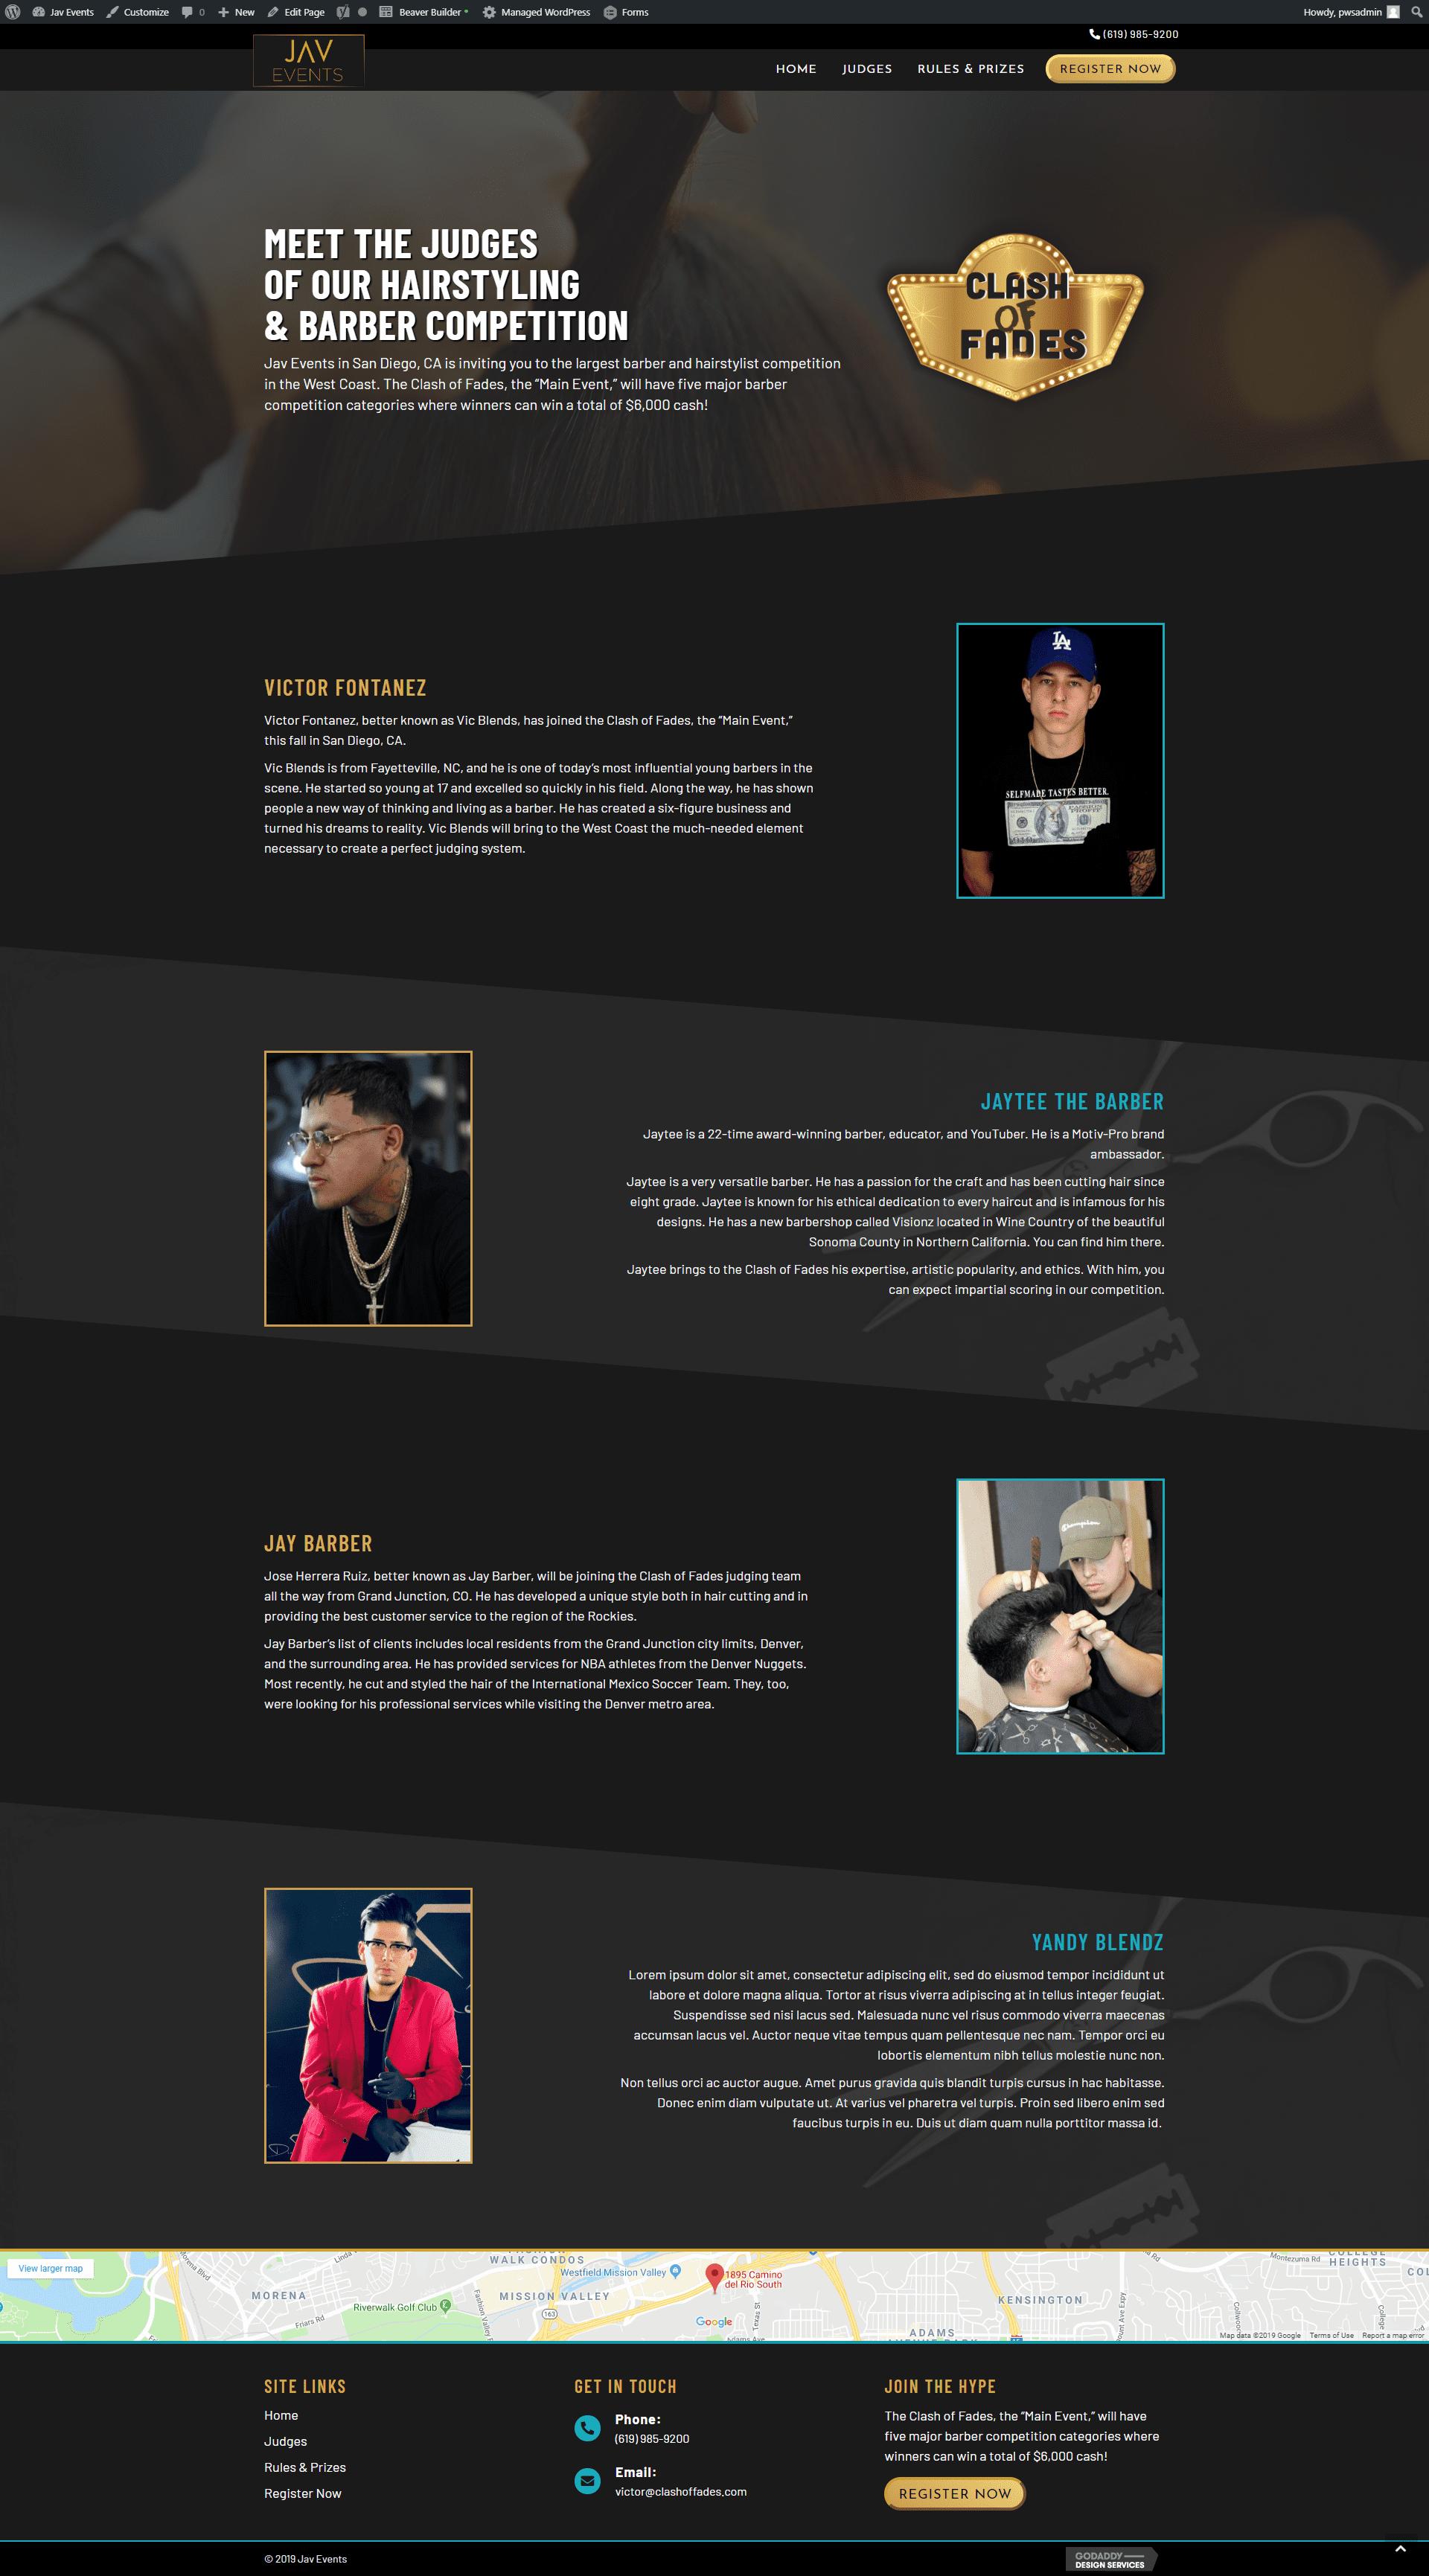 jav events hair site - judges